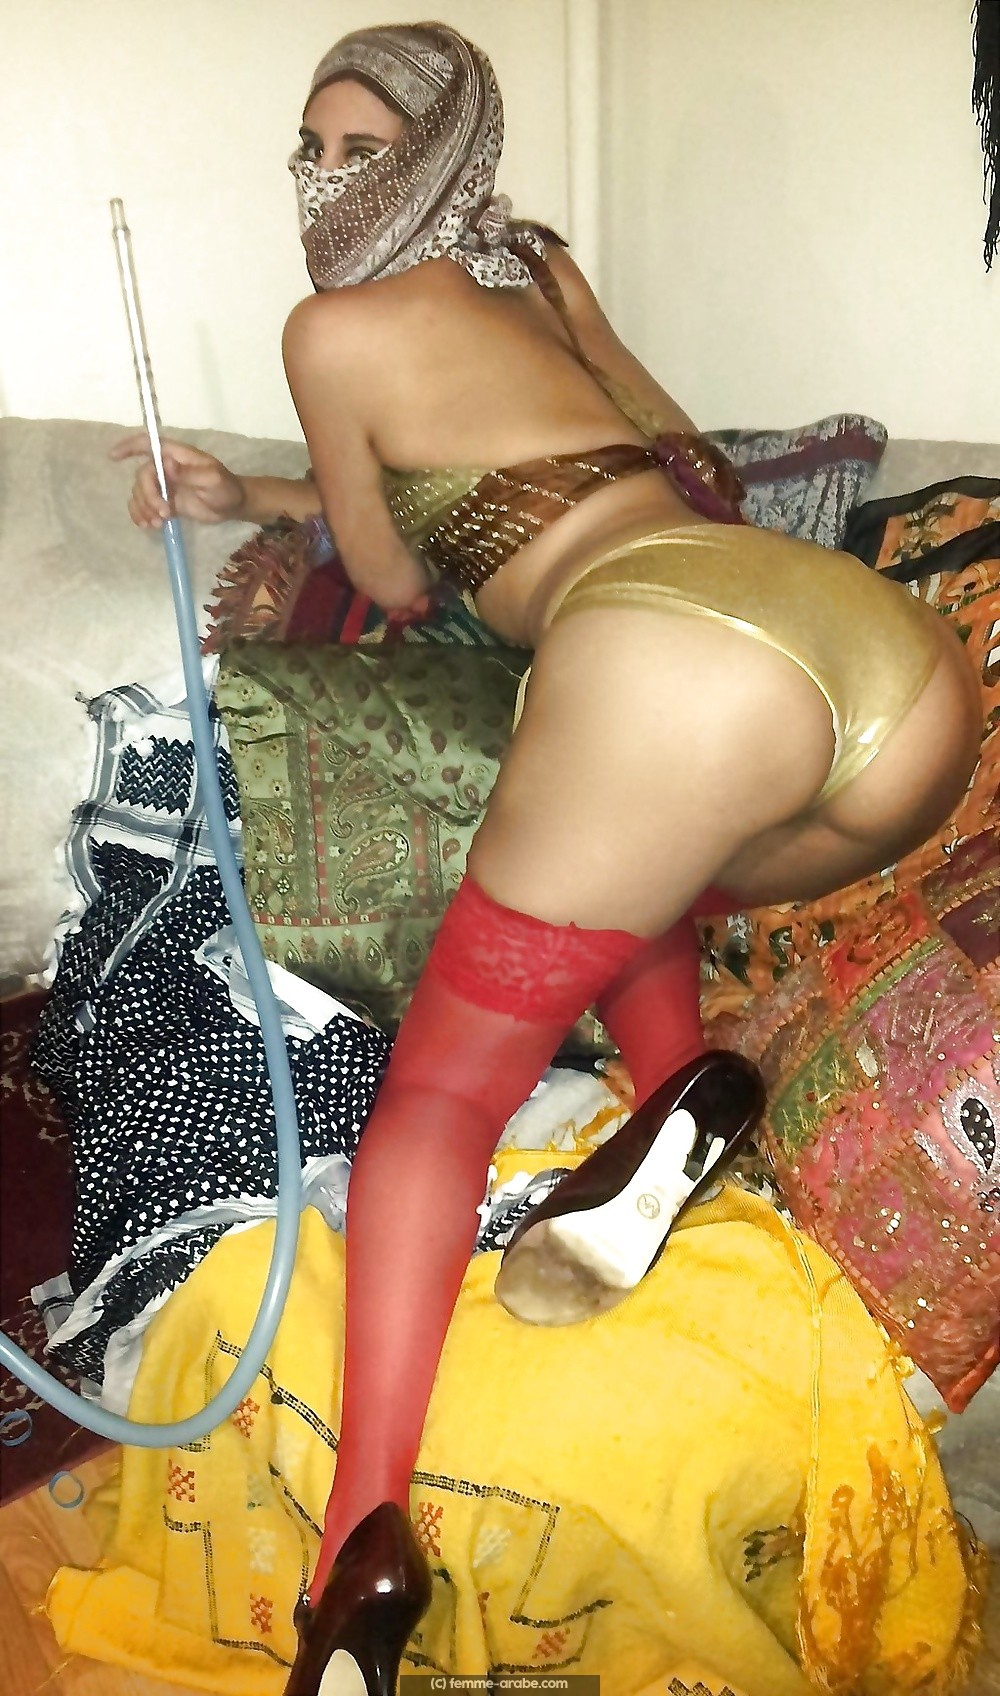 Baise avec jeune femme musulmane sexy